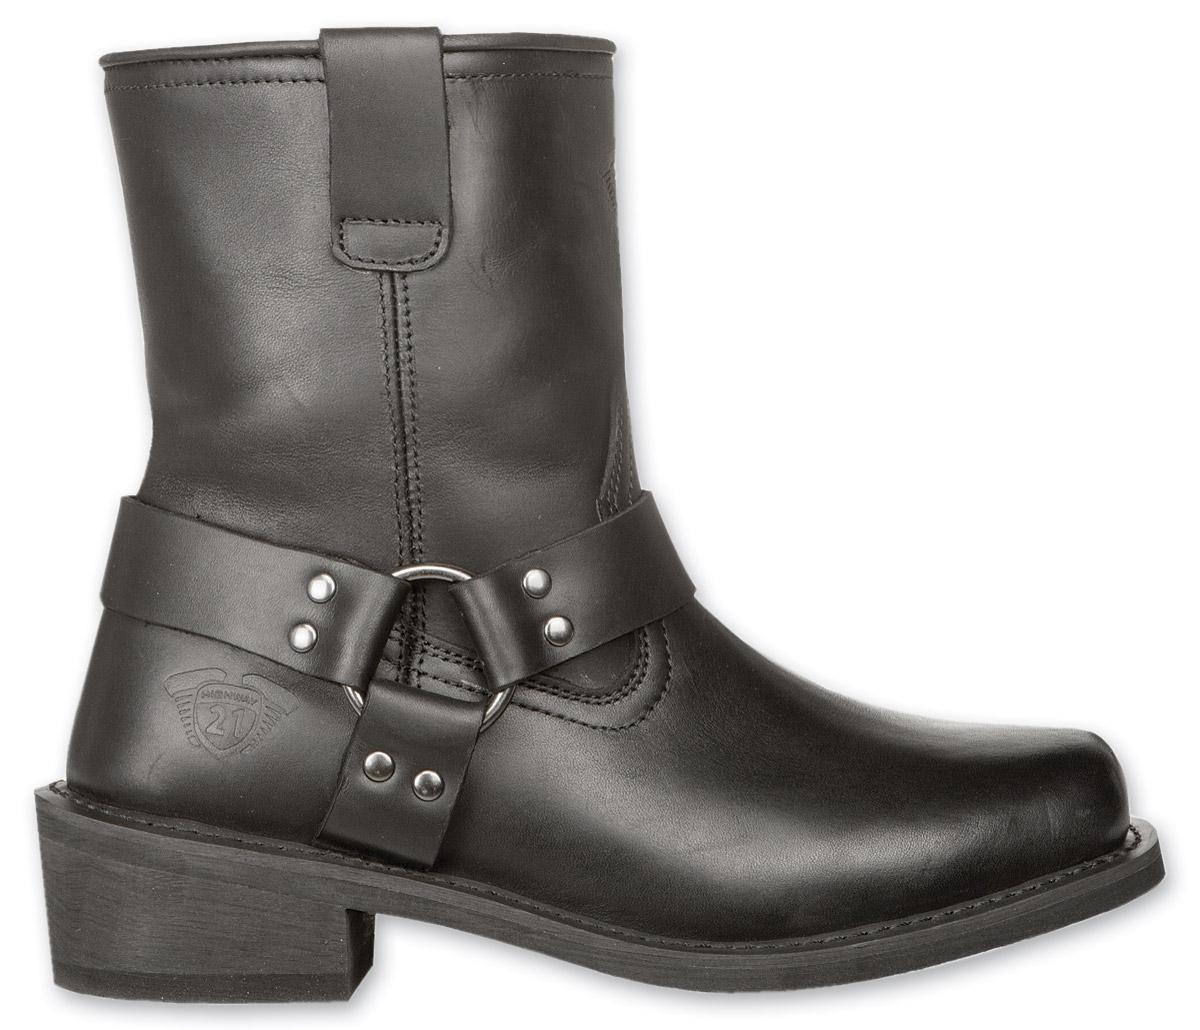 Highway 21 Men's Spark Harness Low Black Boots